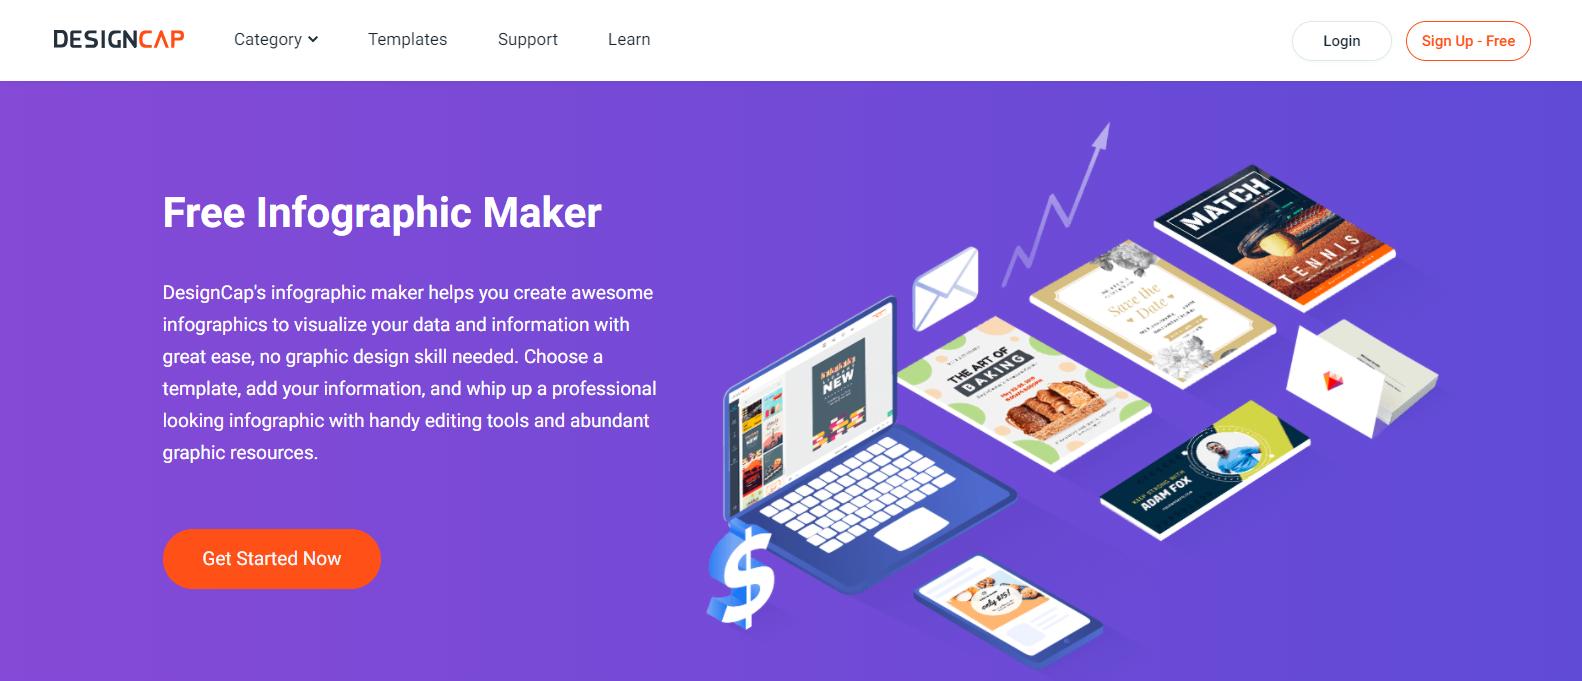 DesignCap - Best Infographic Design Website Online